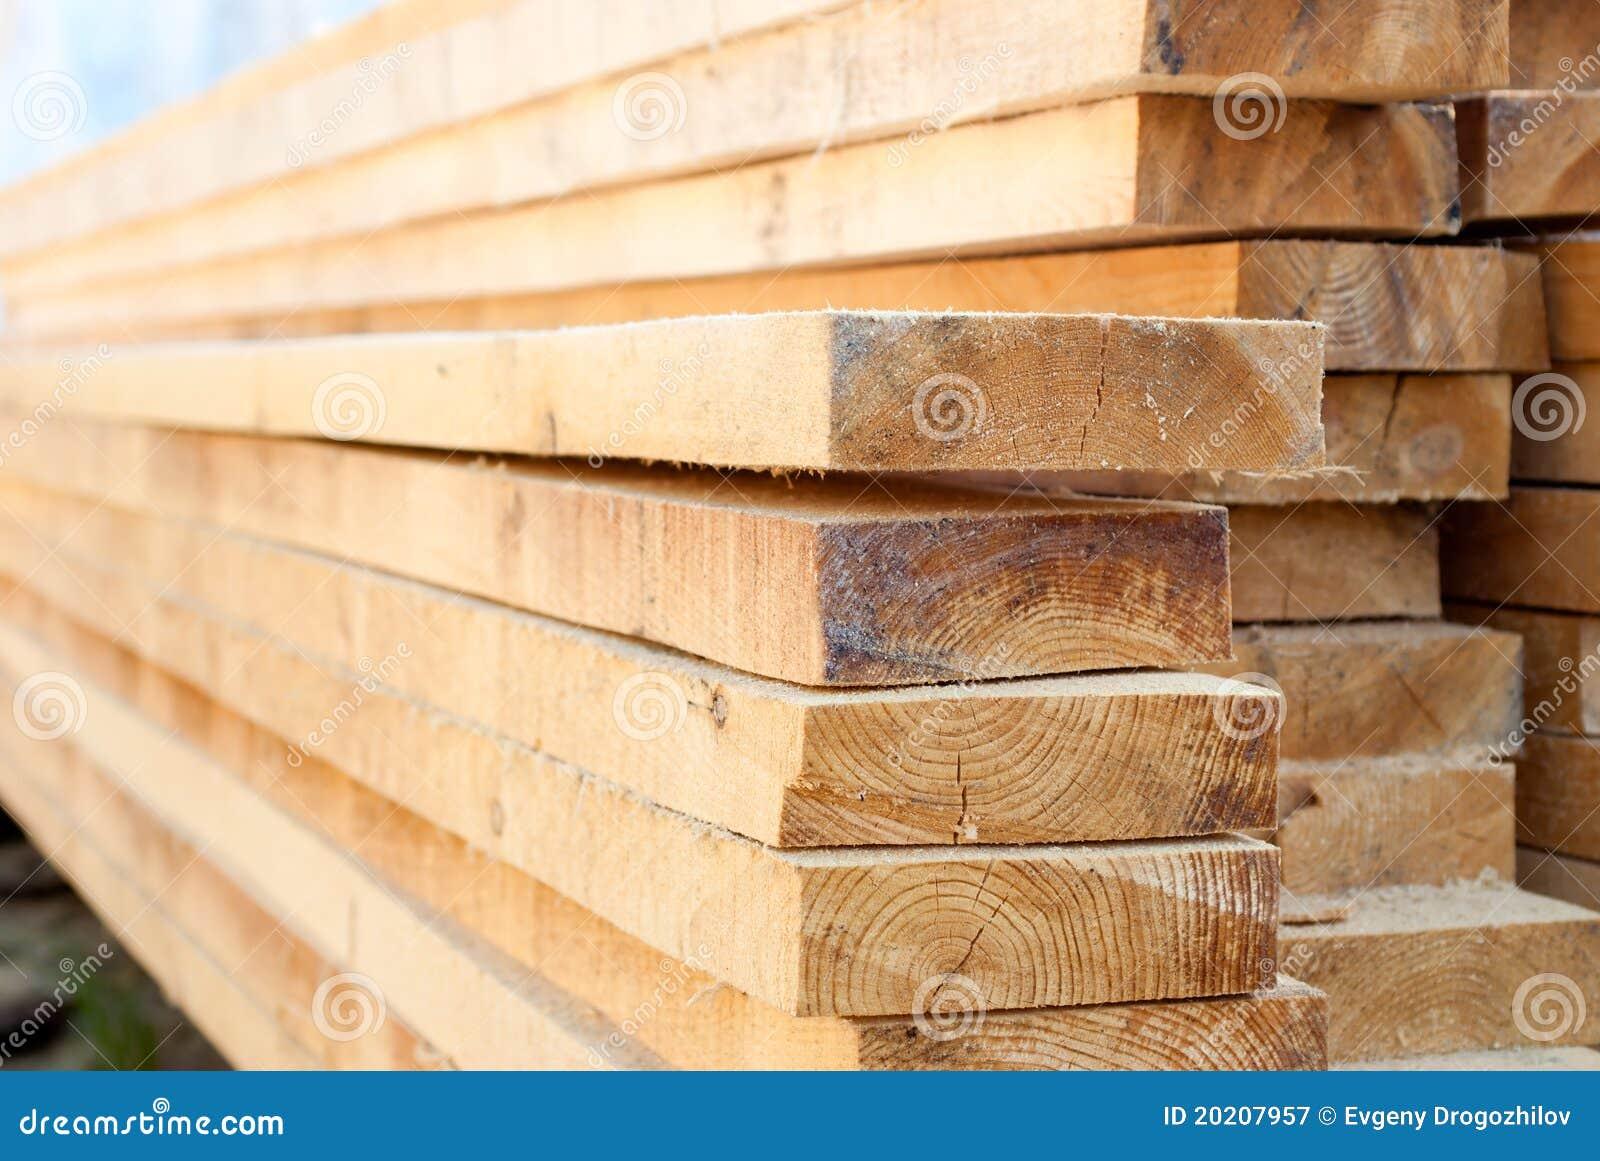 Edging board